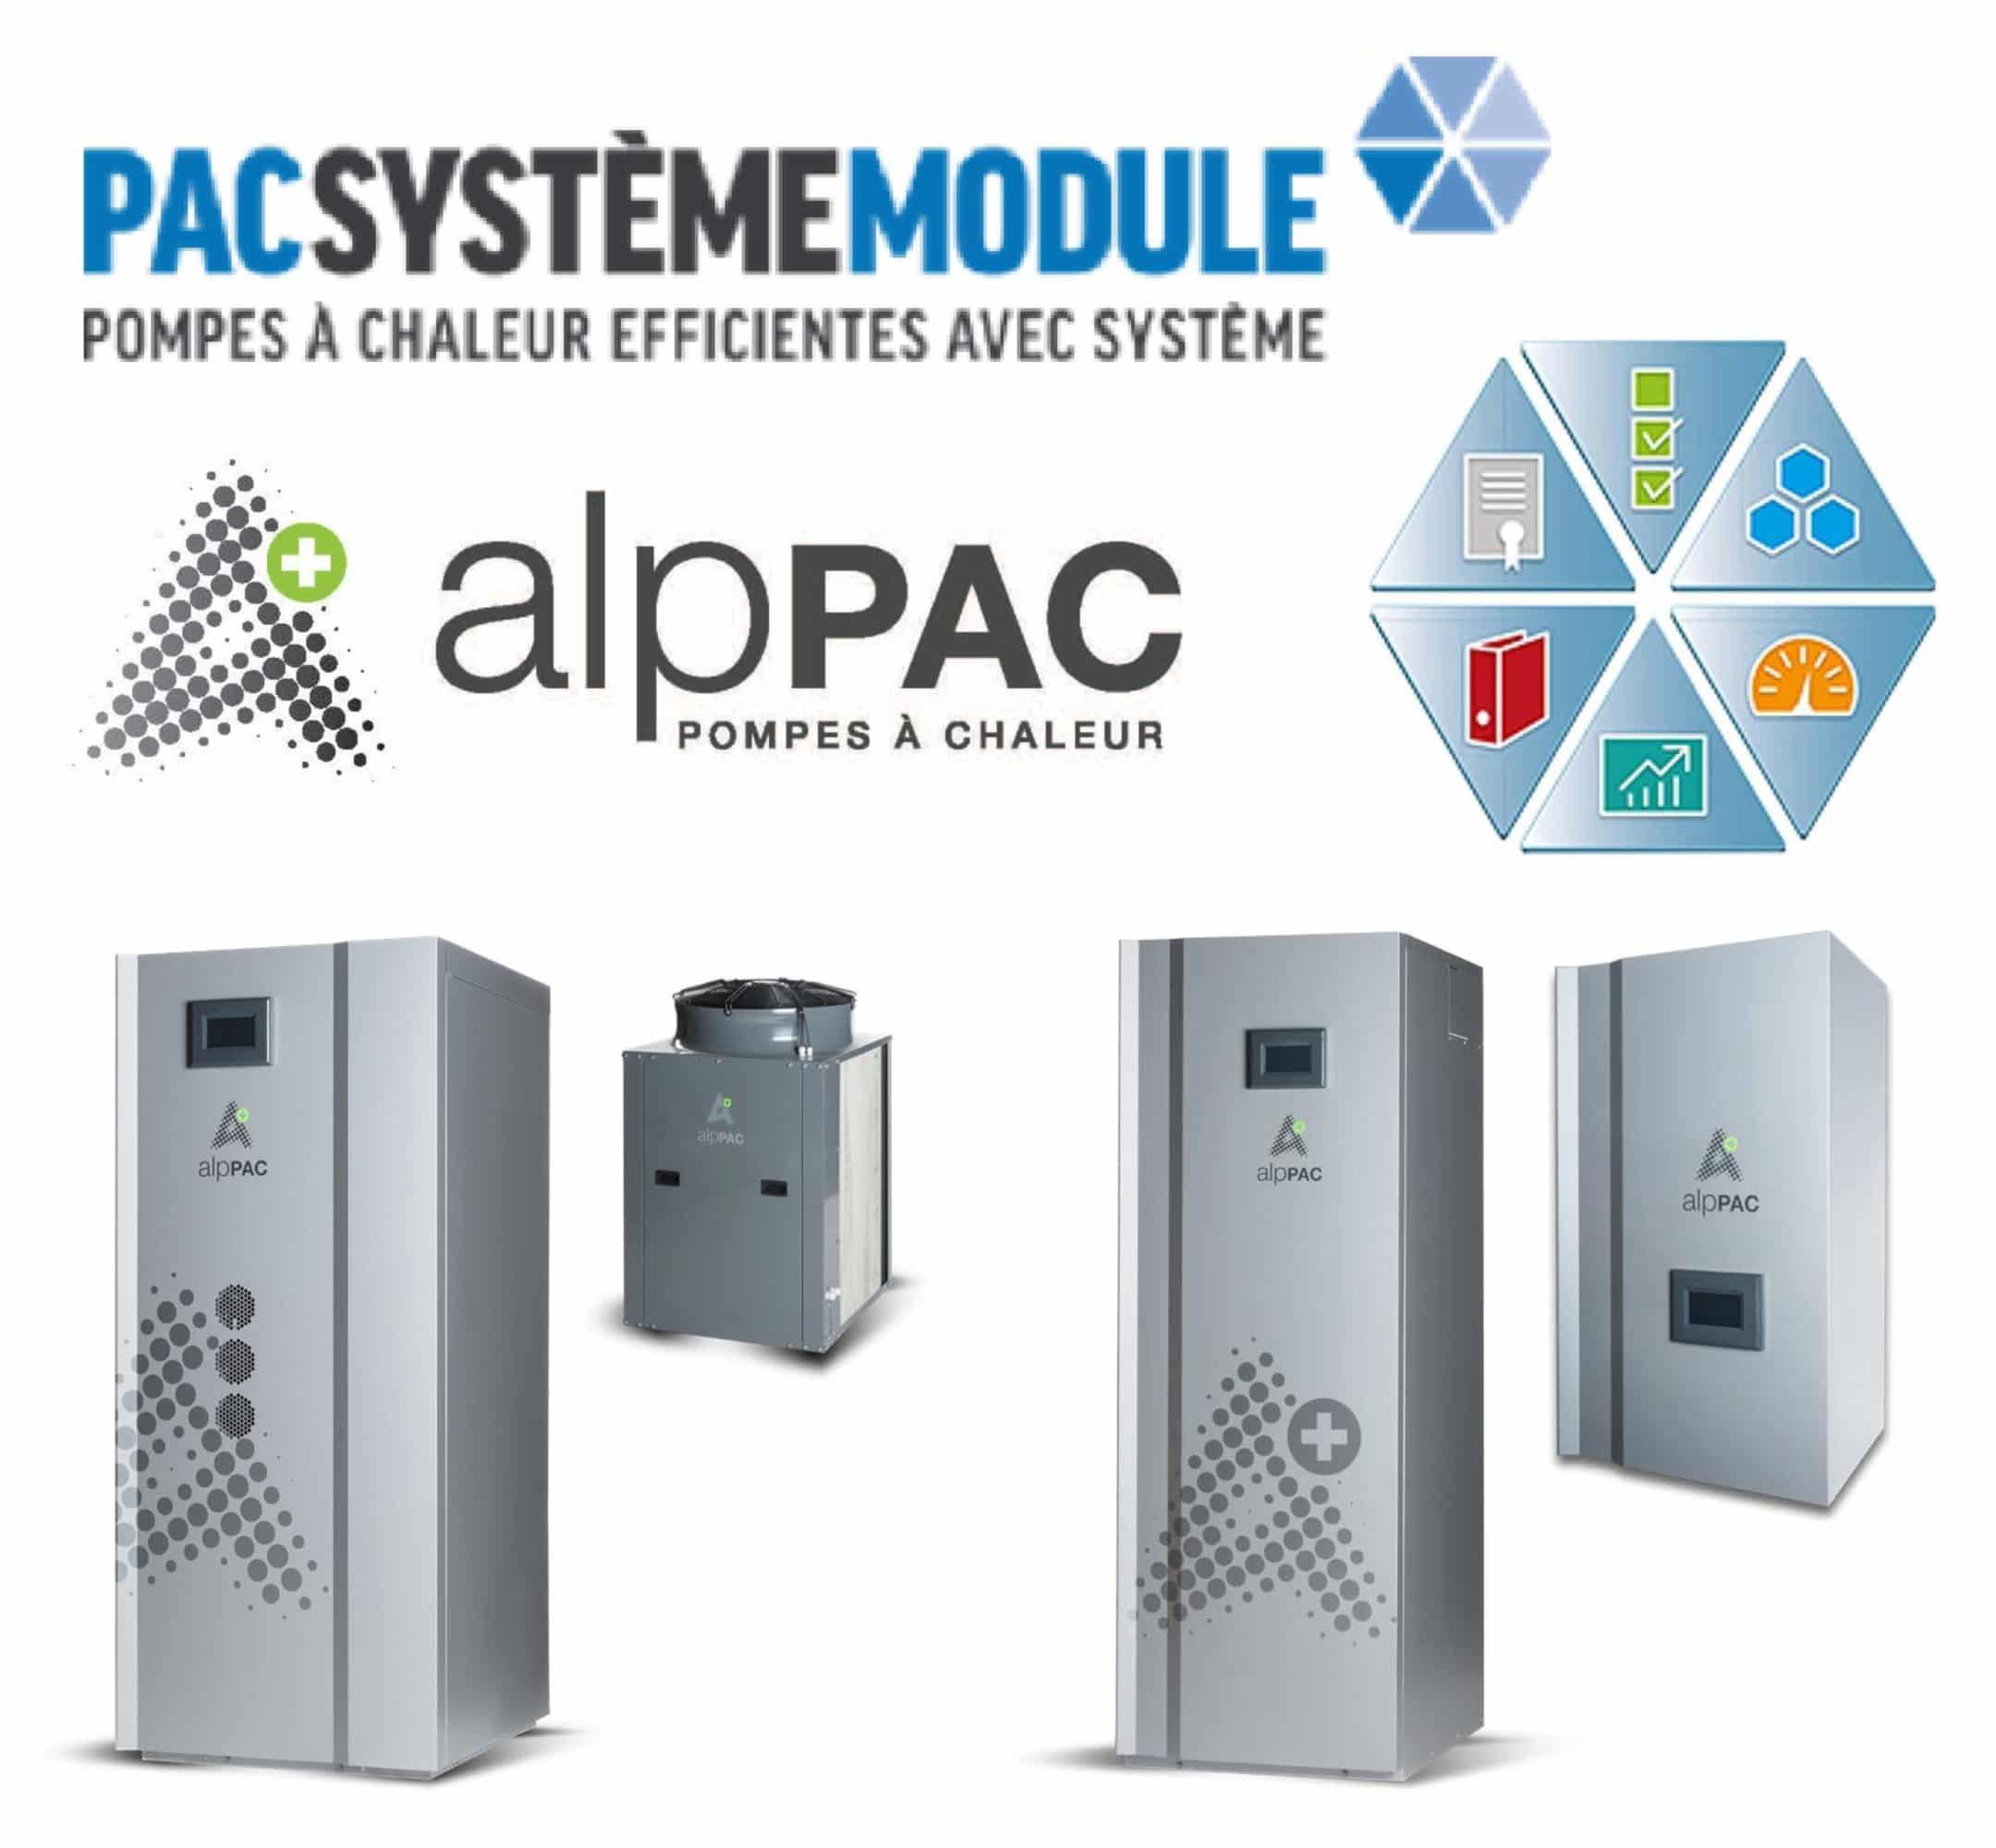 Pac Système module alpPAC